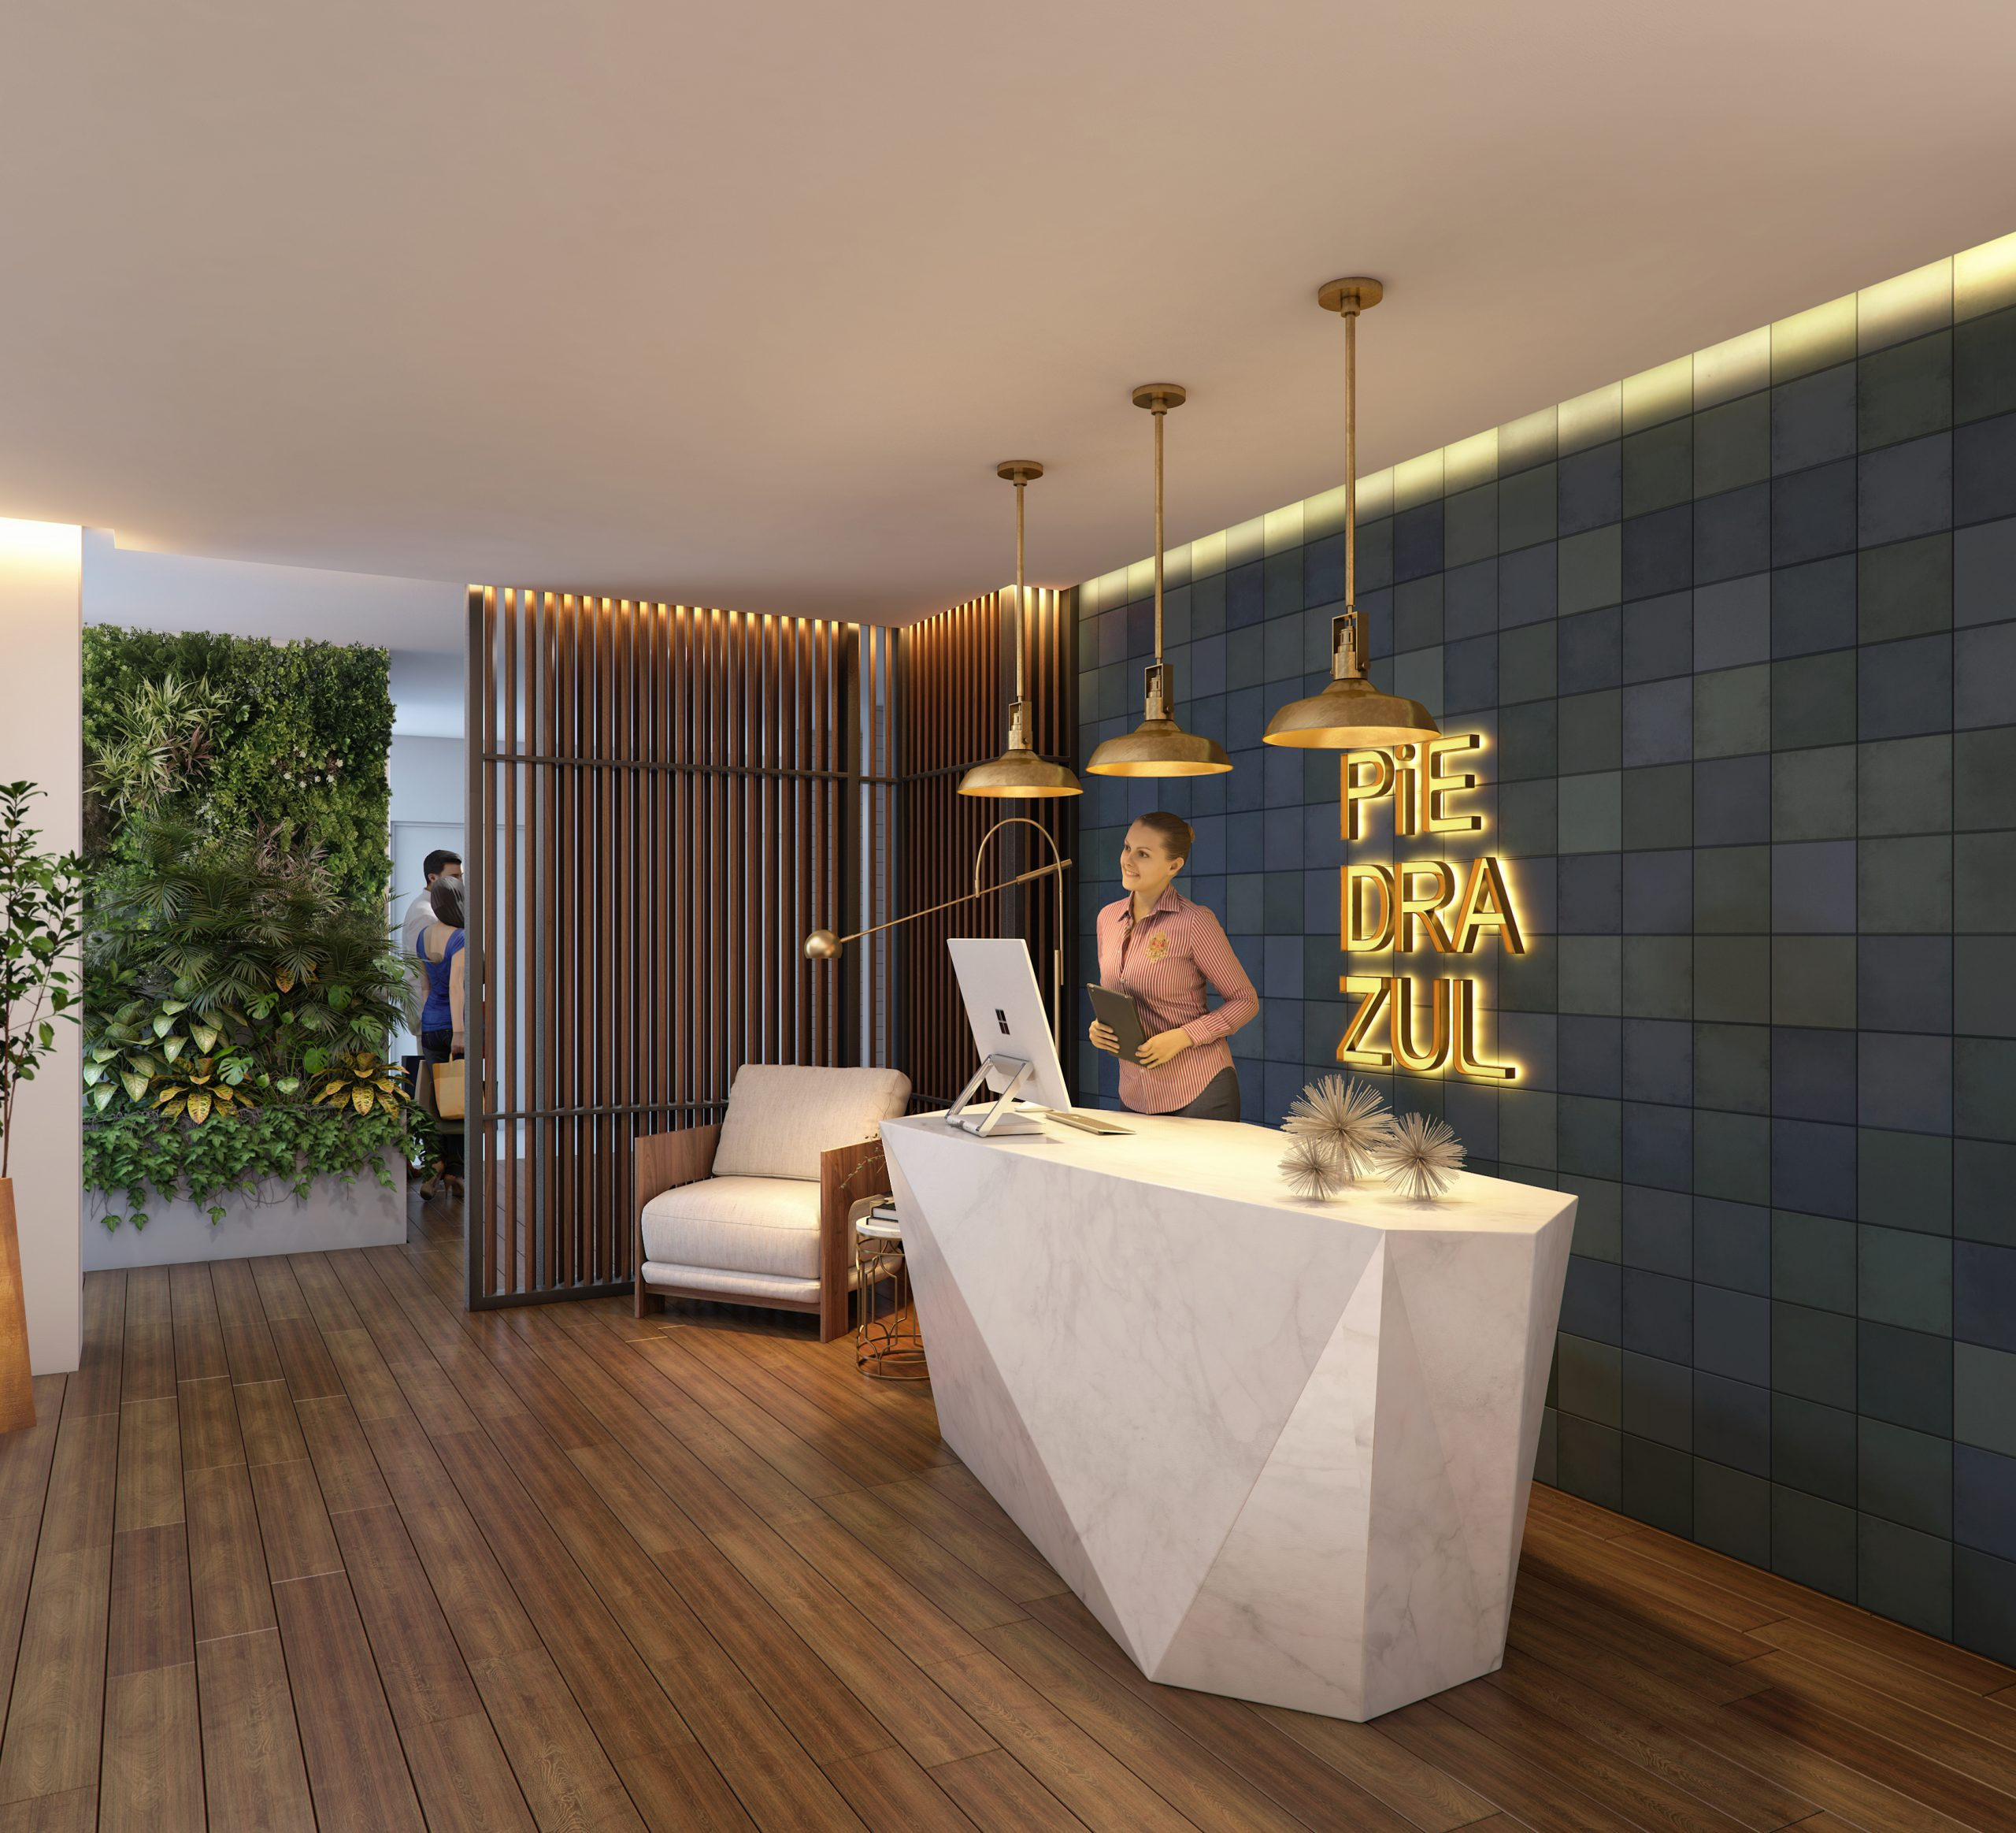 03 - LOBBY - PIEDRAZULL - Pelicano Properties - Playa del Carmen